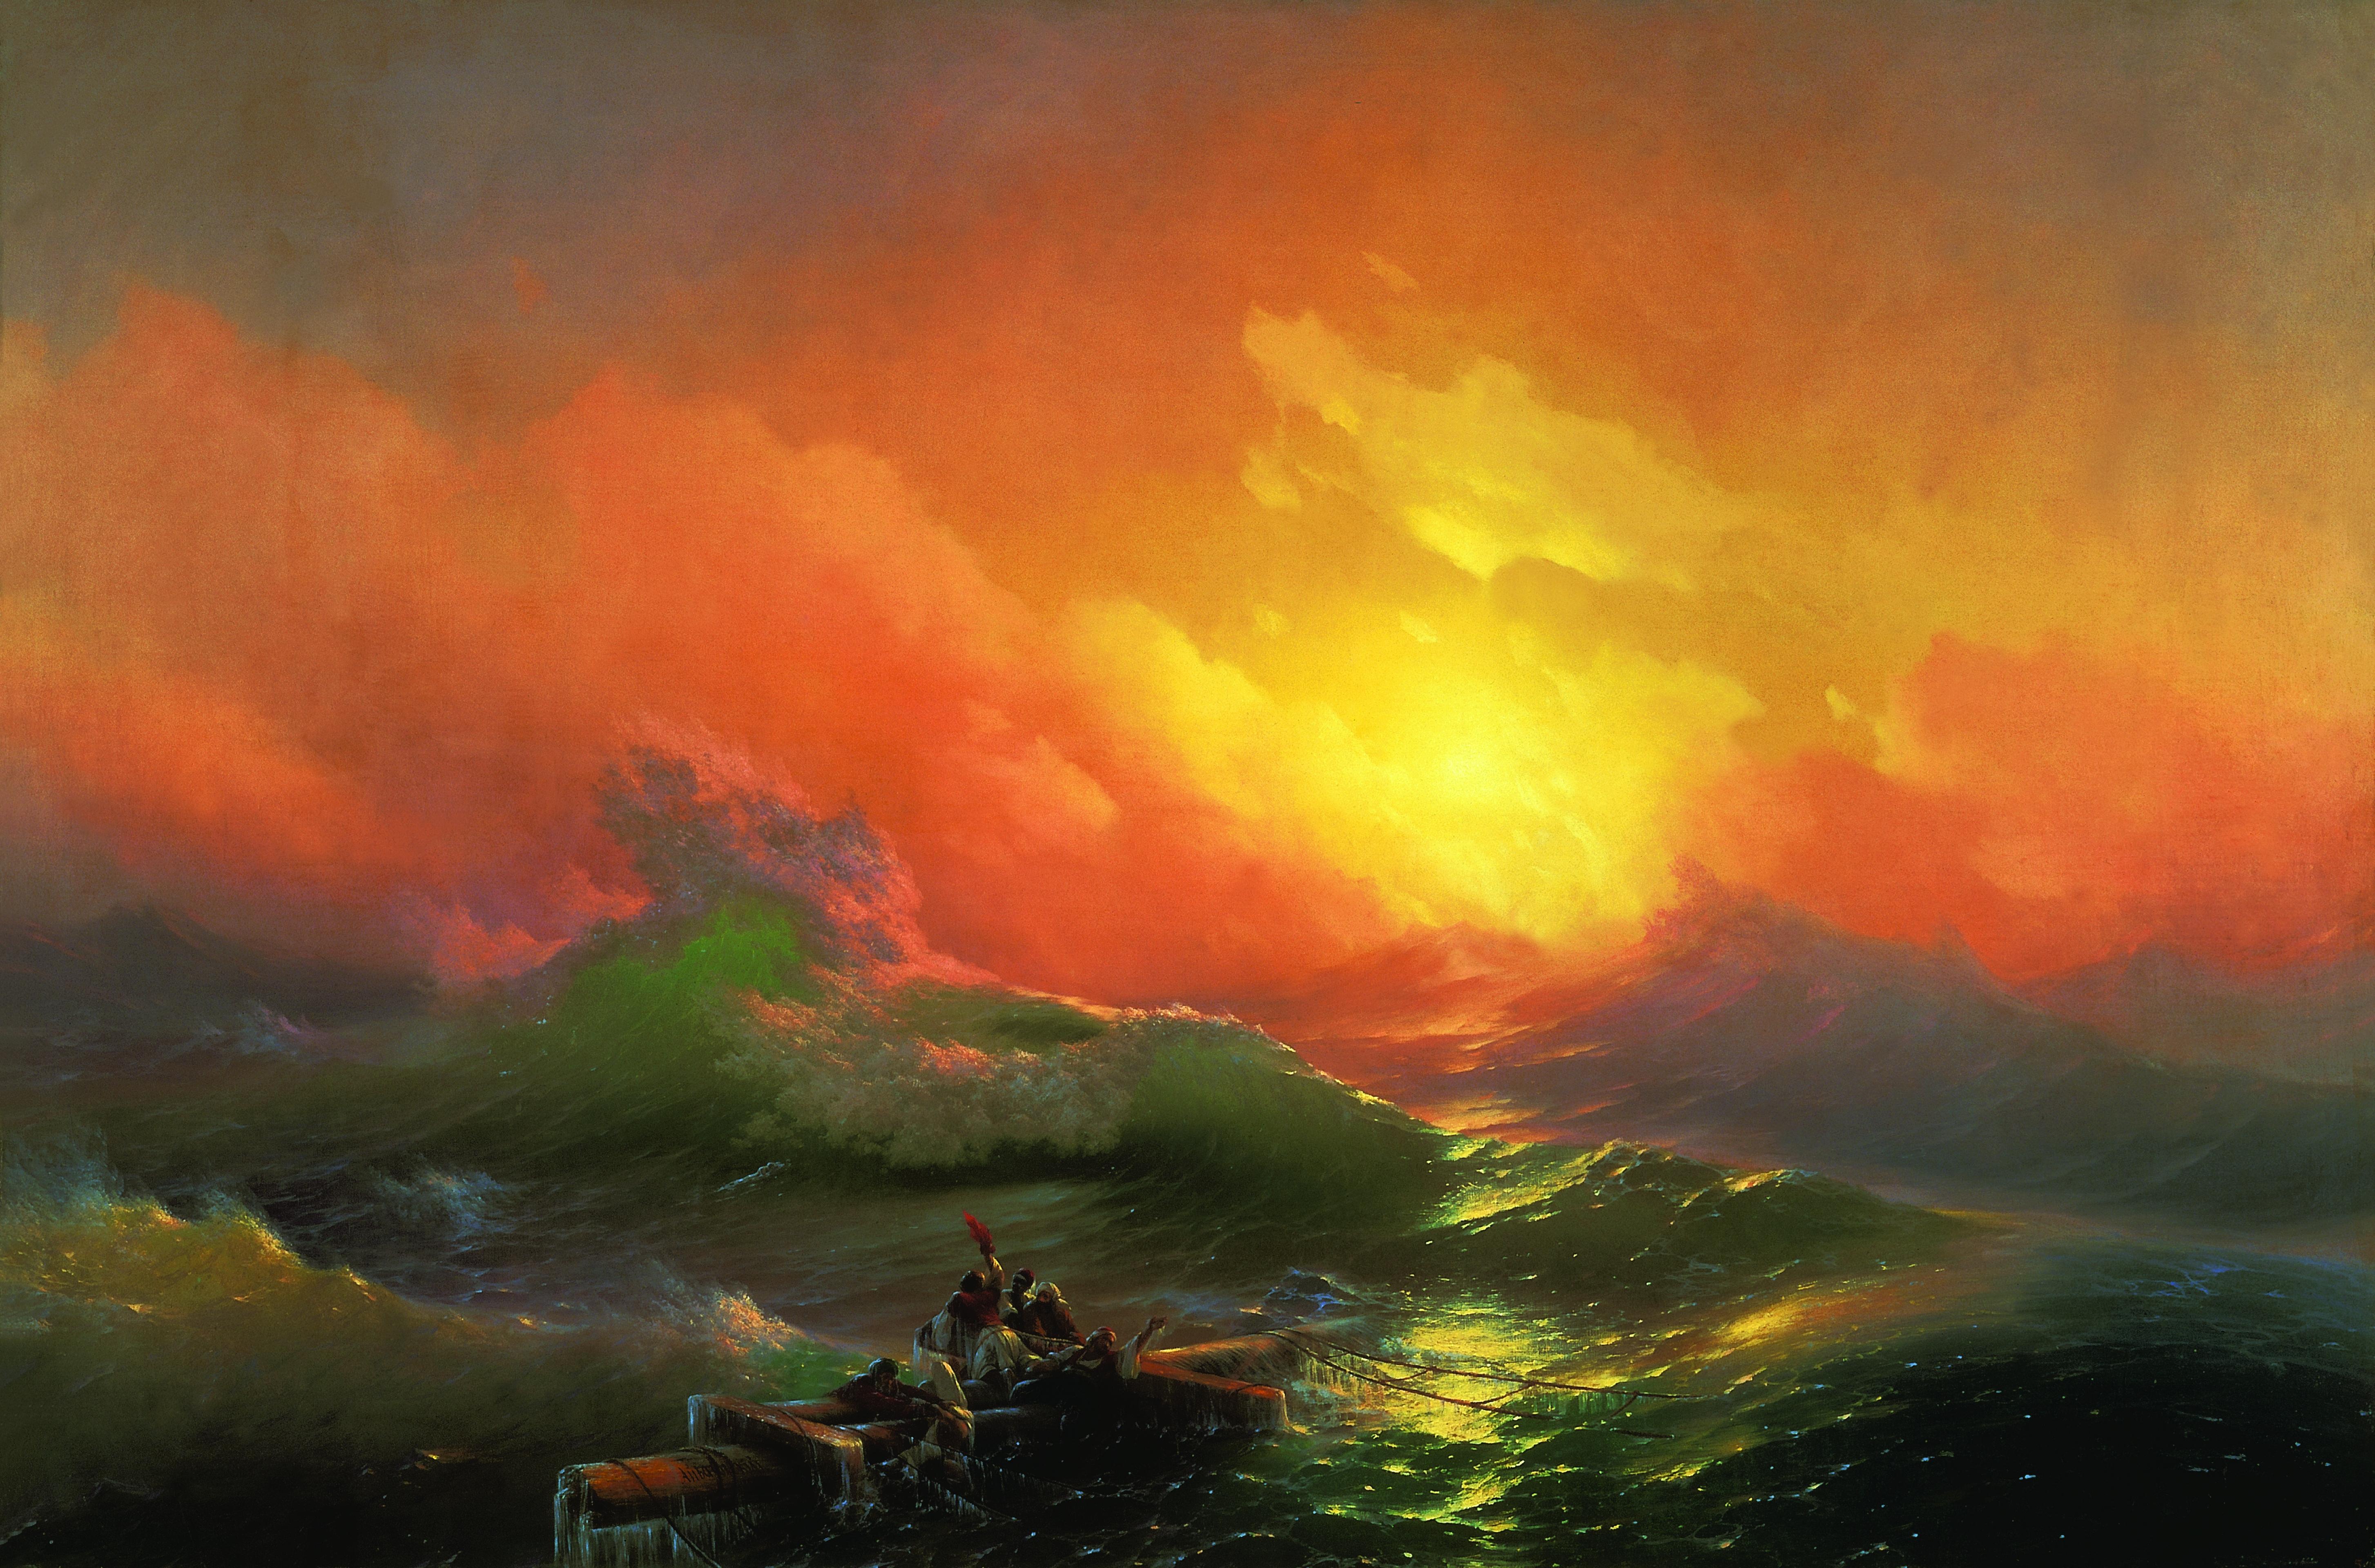 Aivazovsky%2C_Ivan_-_The_Ninth_Wave.jpg